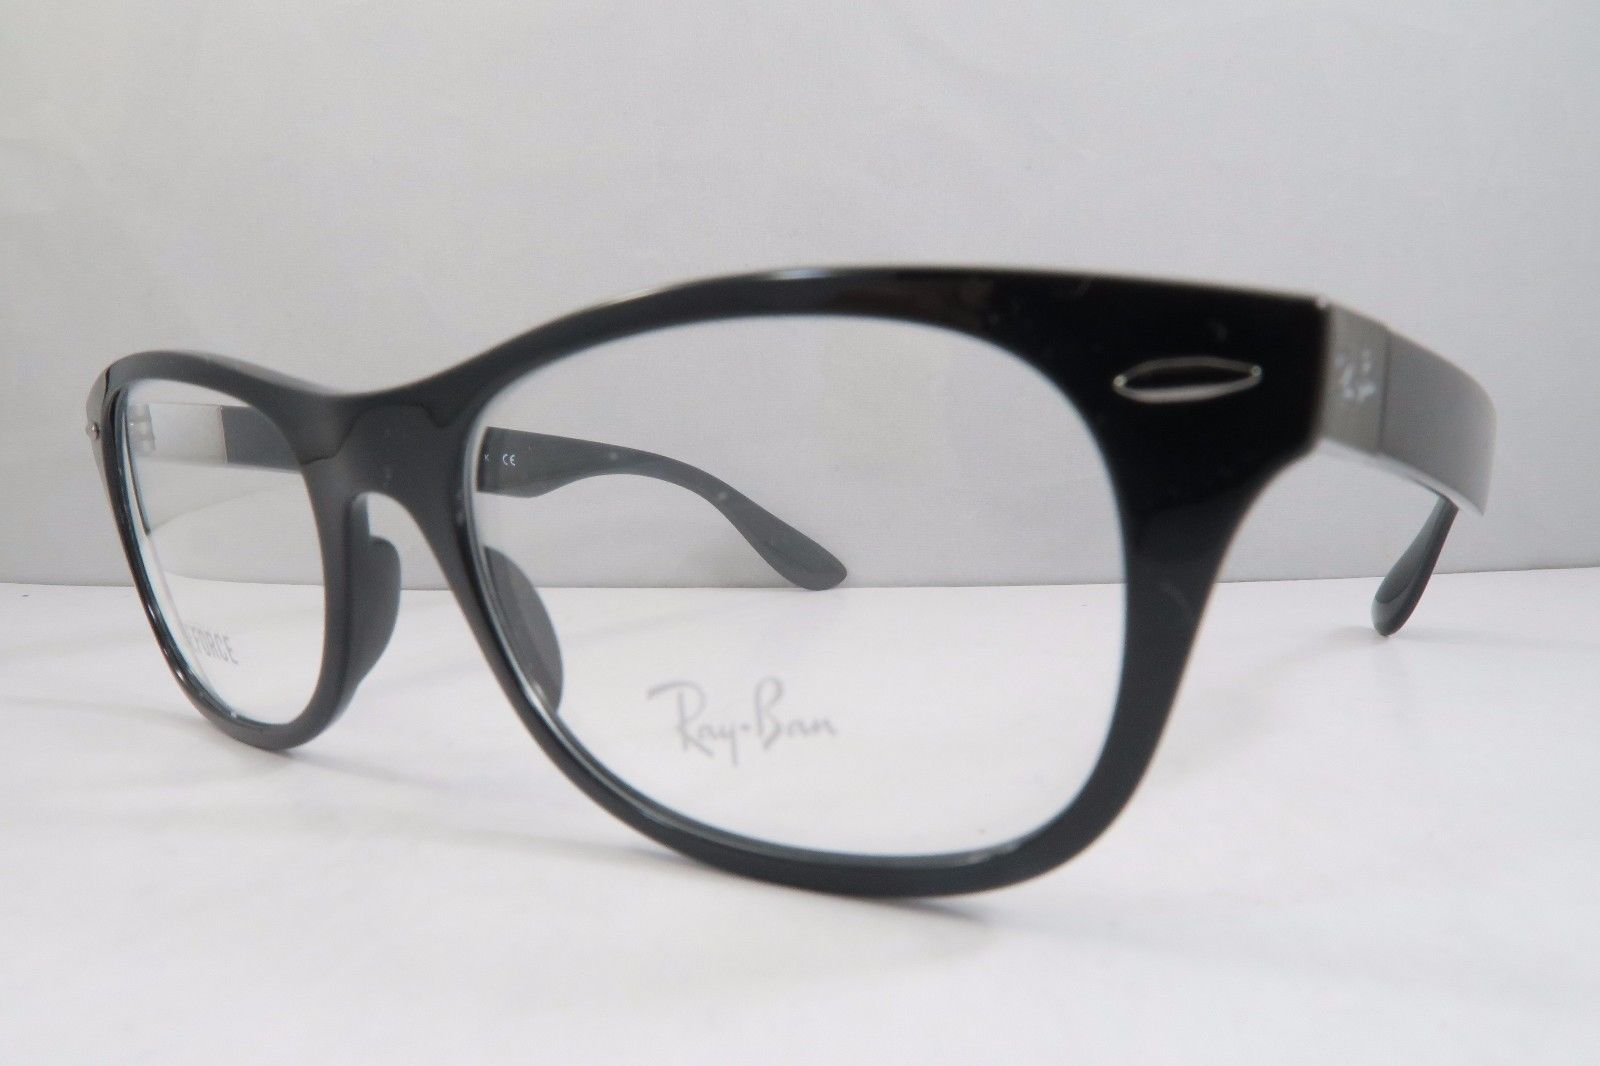 29401c0187cf0 Ray-Ban RB 7032 5206 LITEFORCE Black New Authentic Eyeglasses 52mm - 254